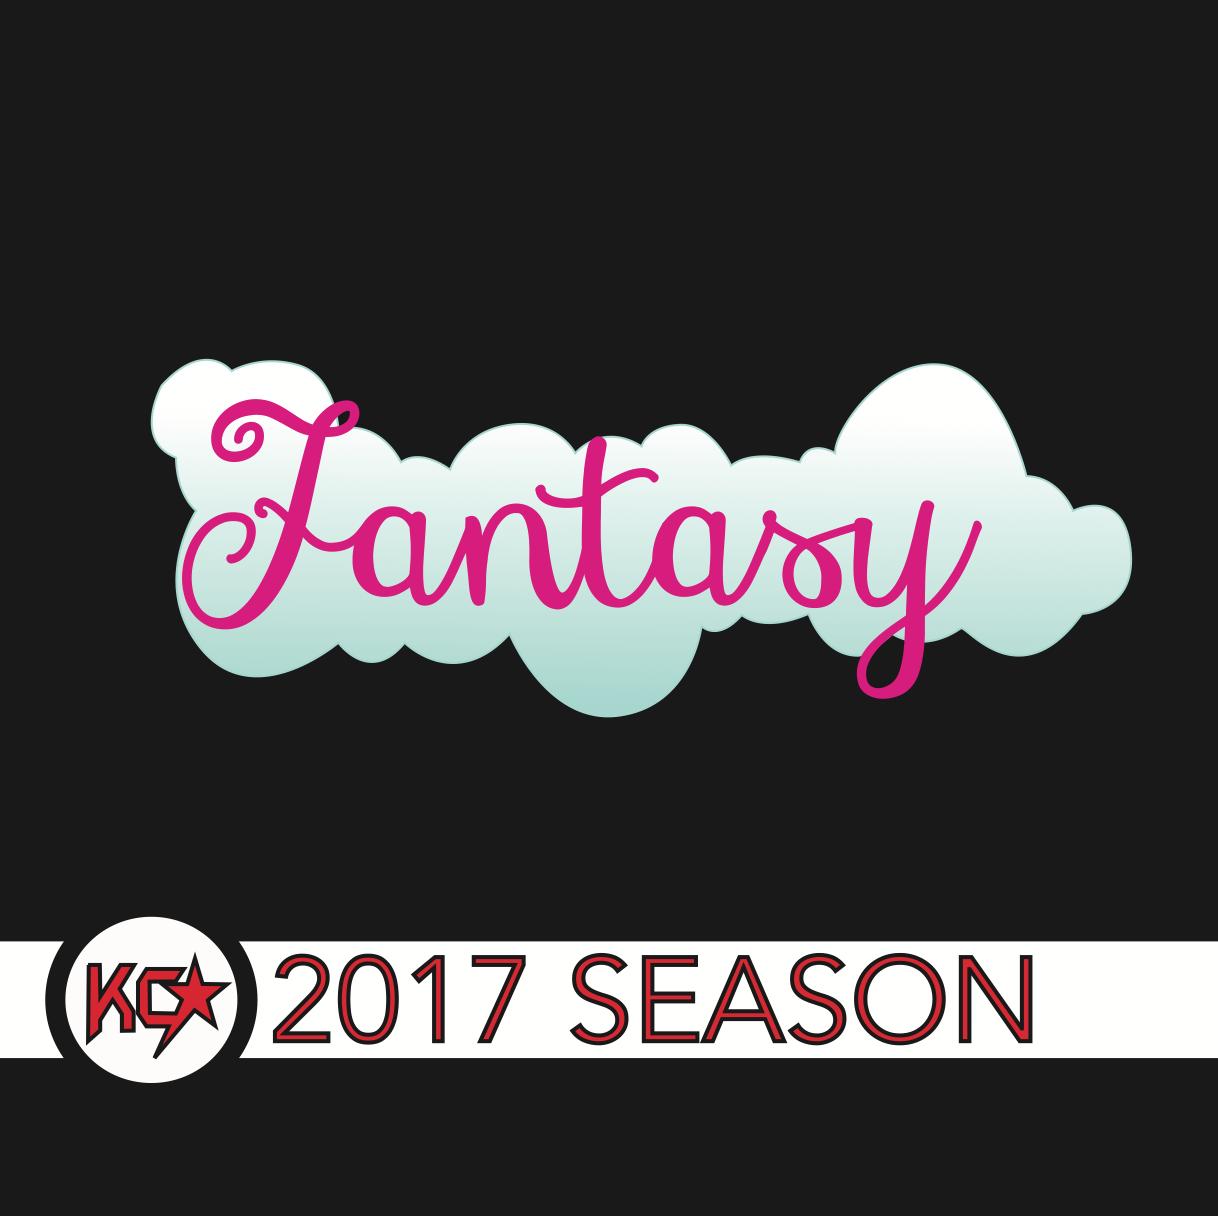 Fantasy2017.png